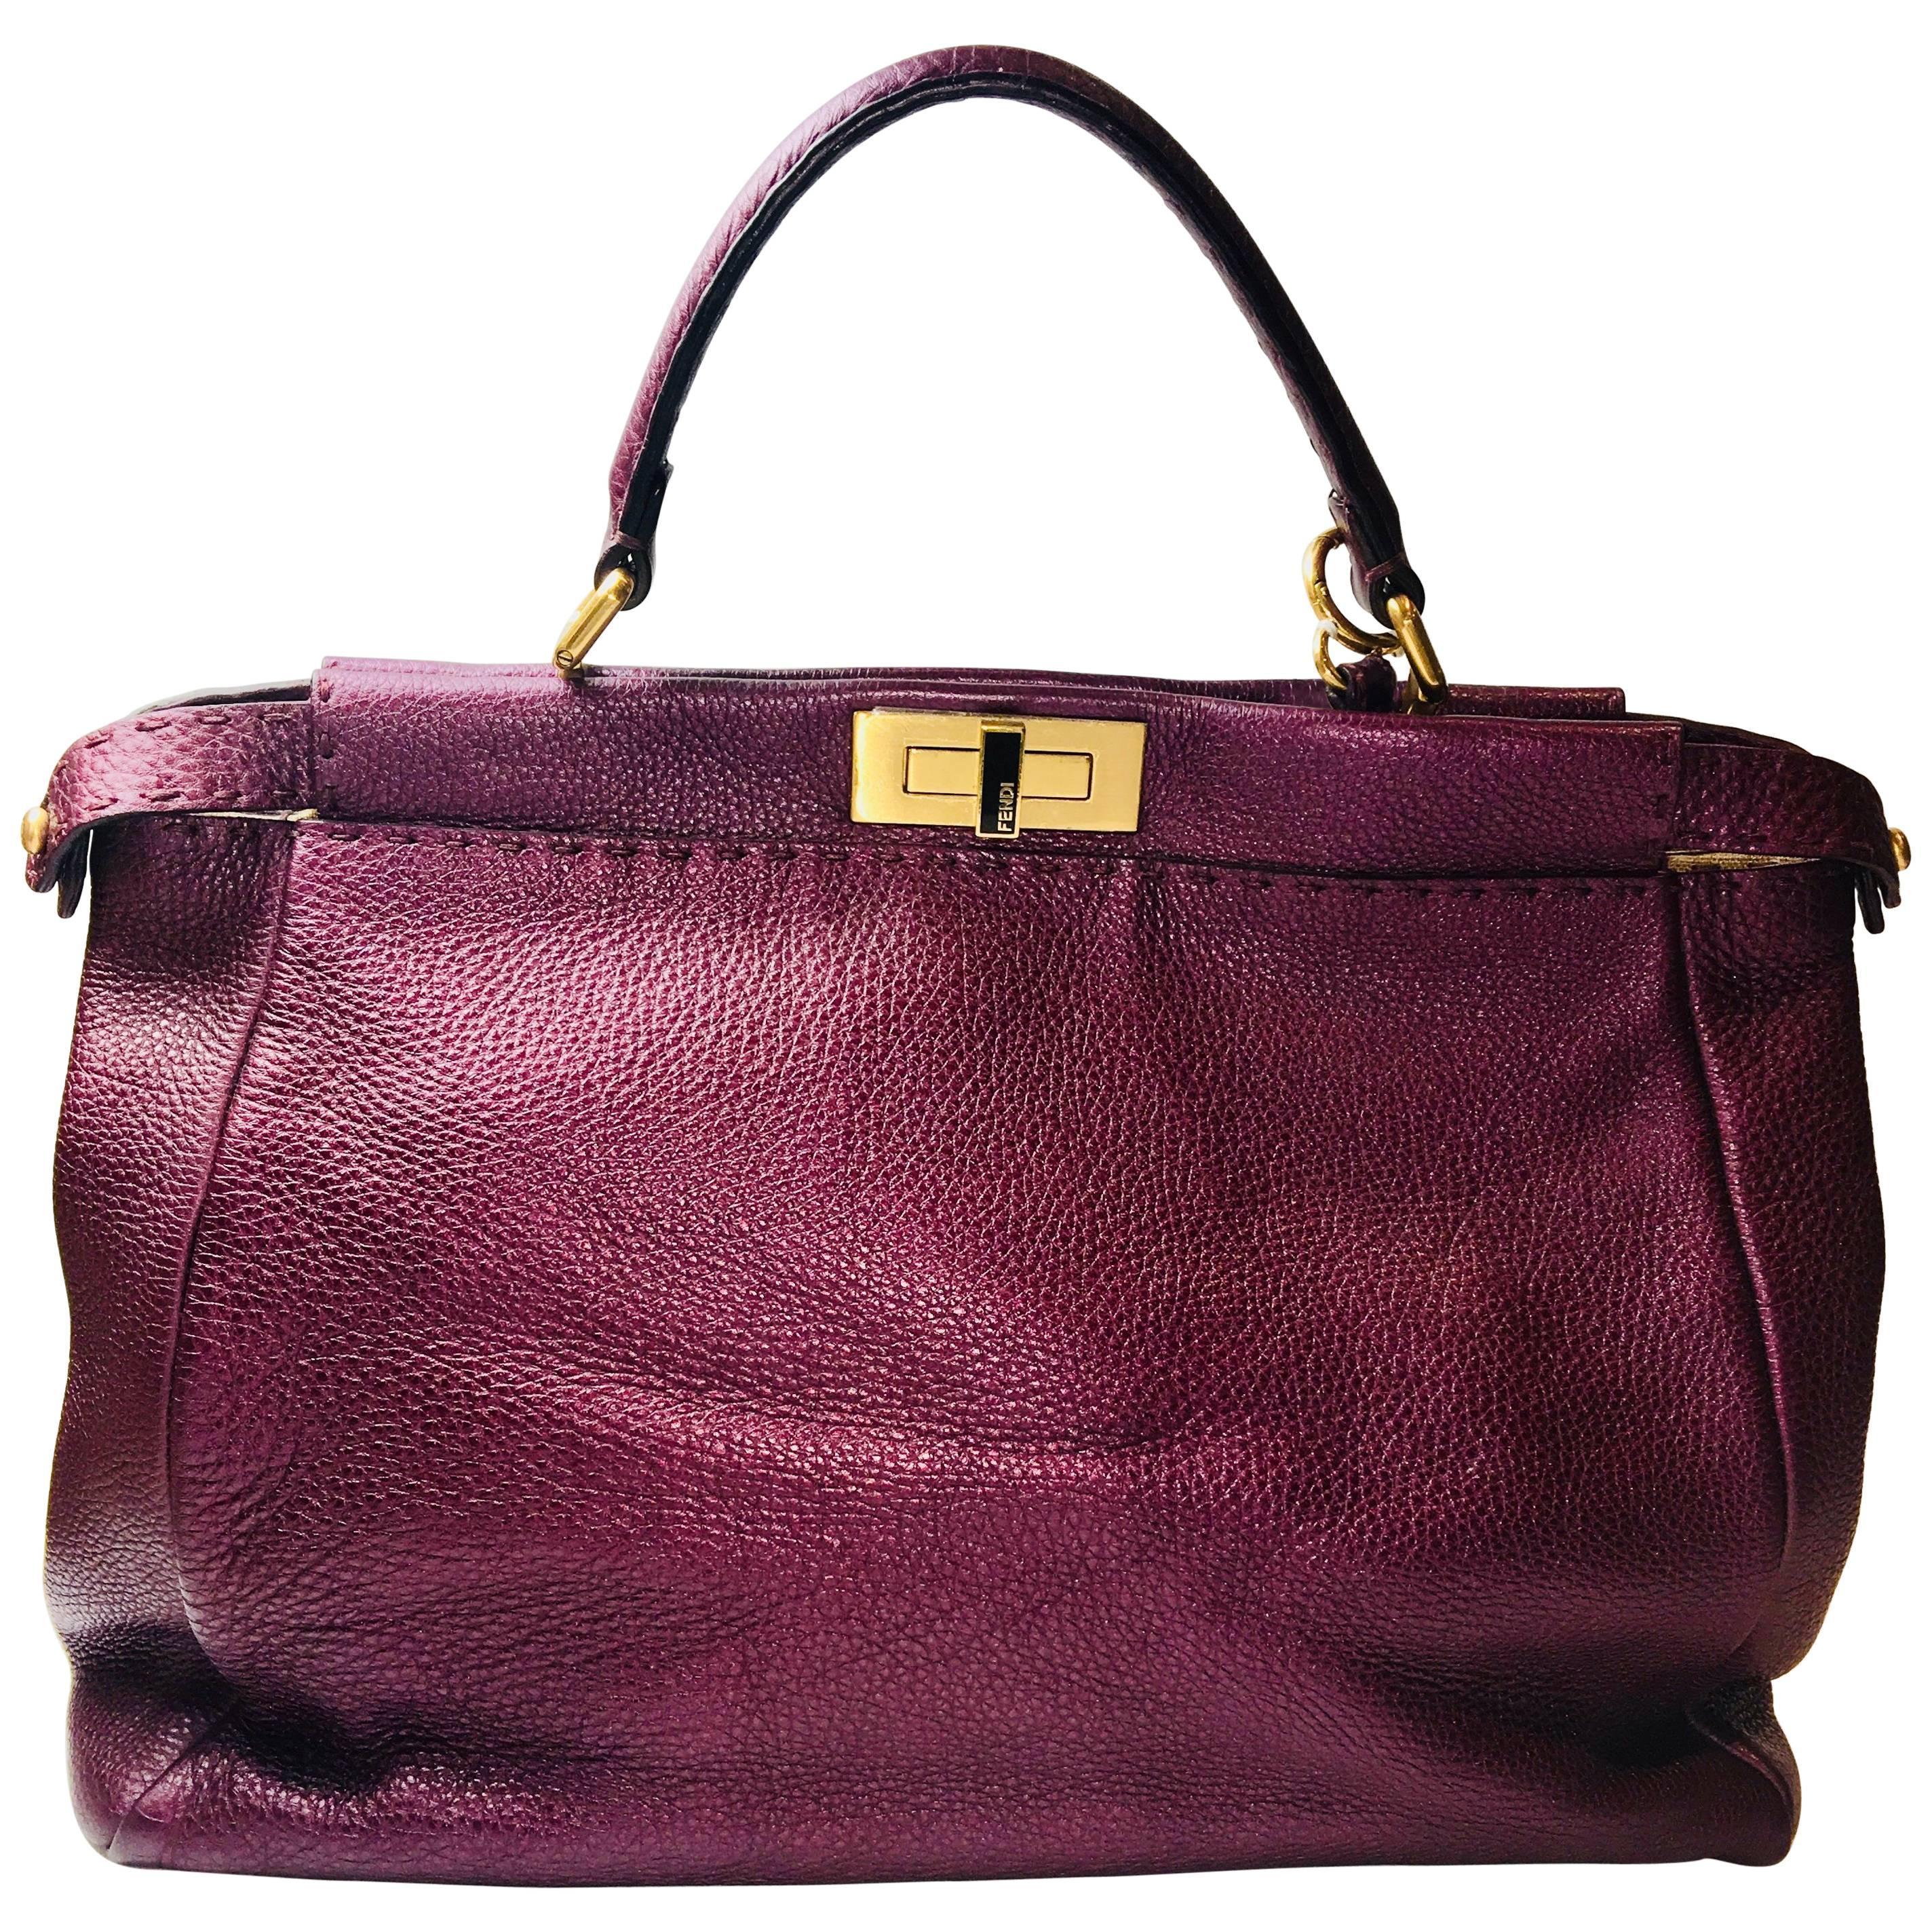 9b51ba0d13 Fendi Selleria Peekaboo Bag at 1stdibs